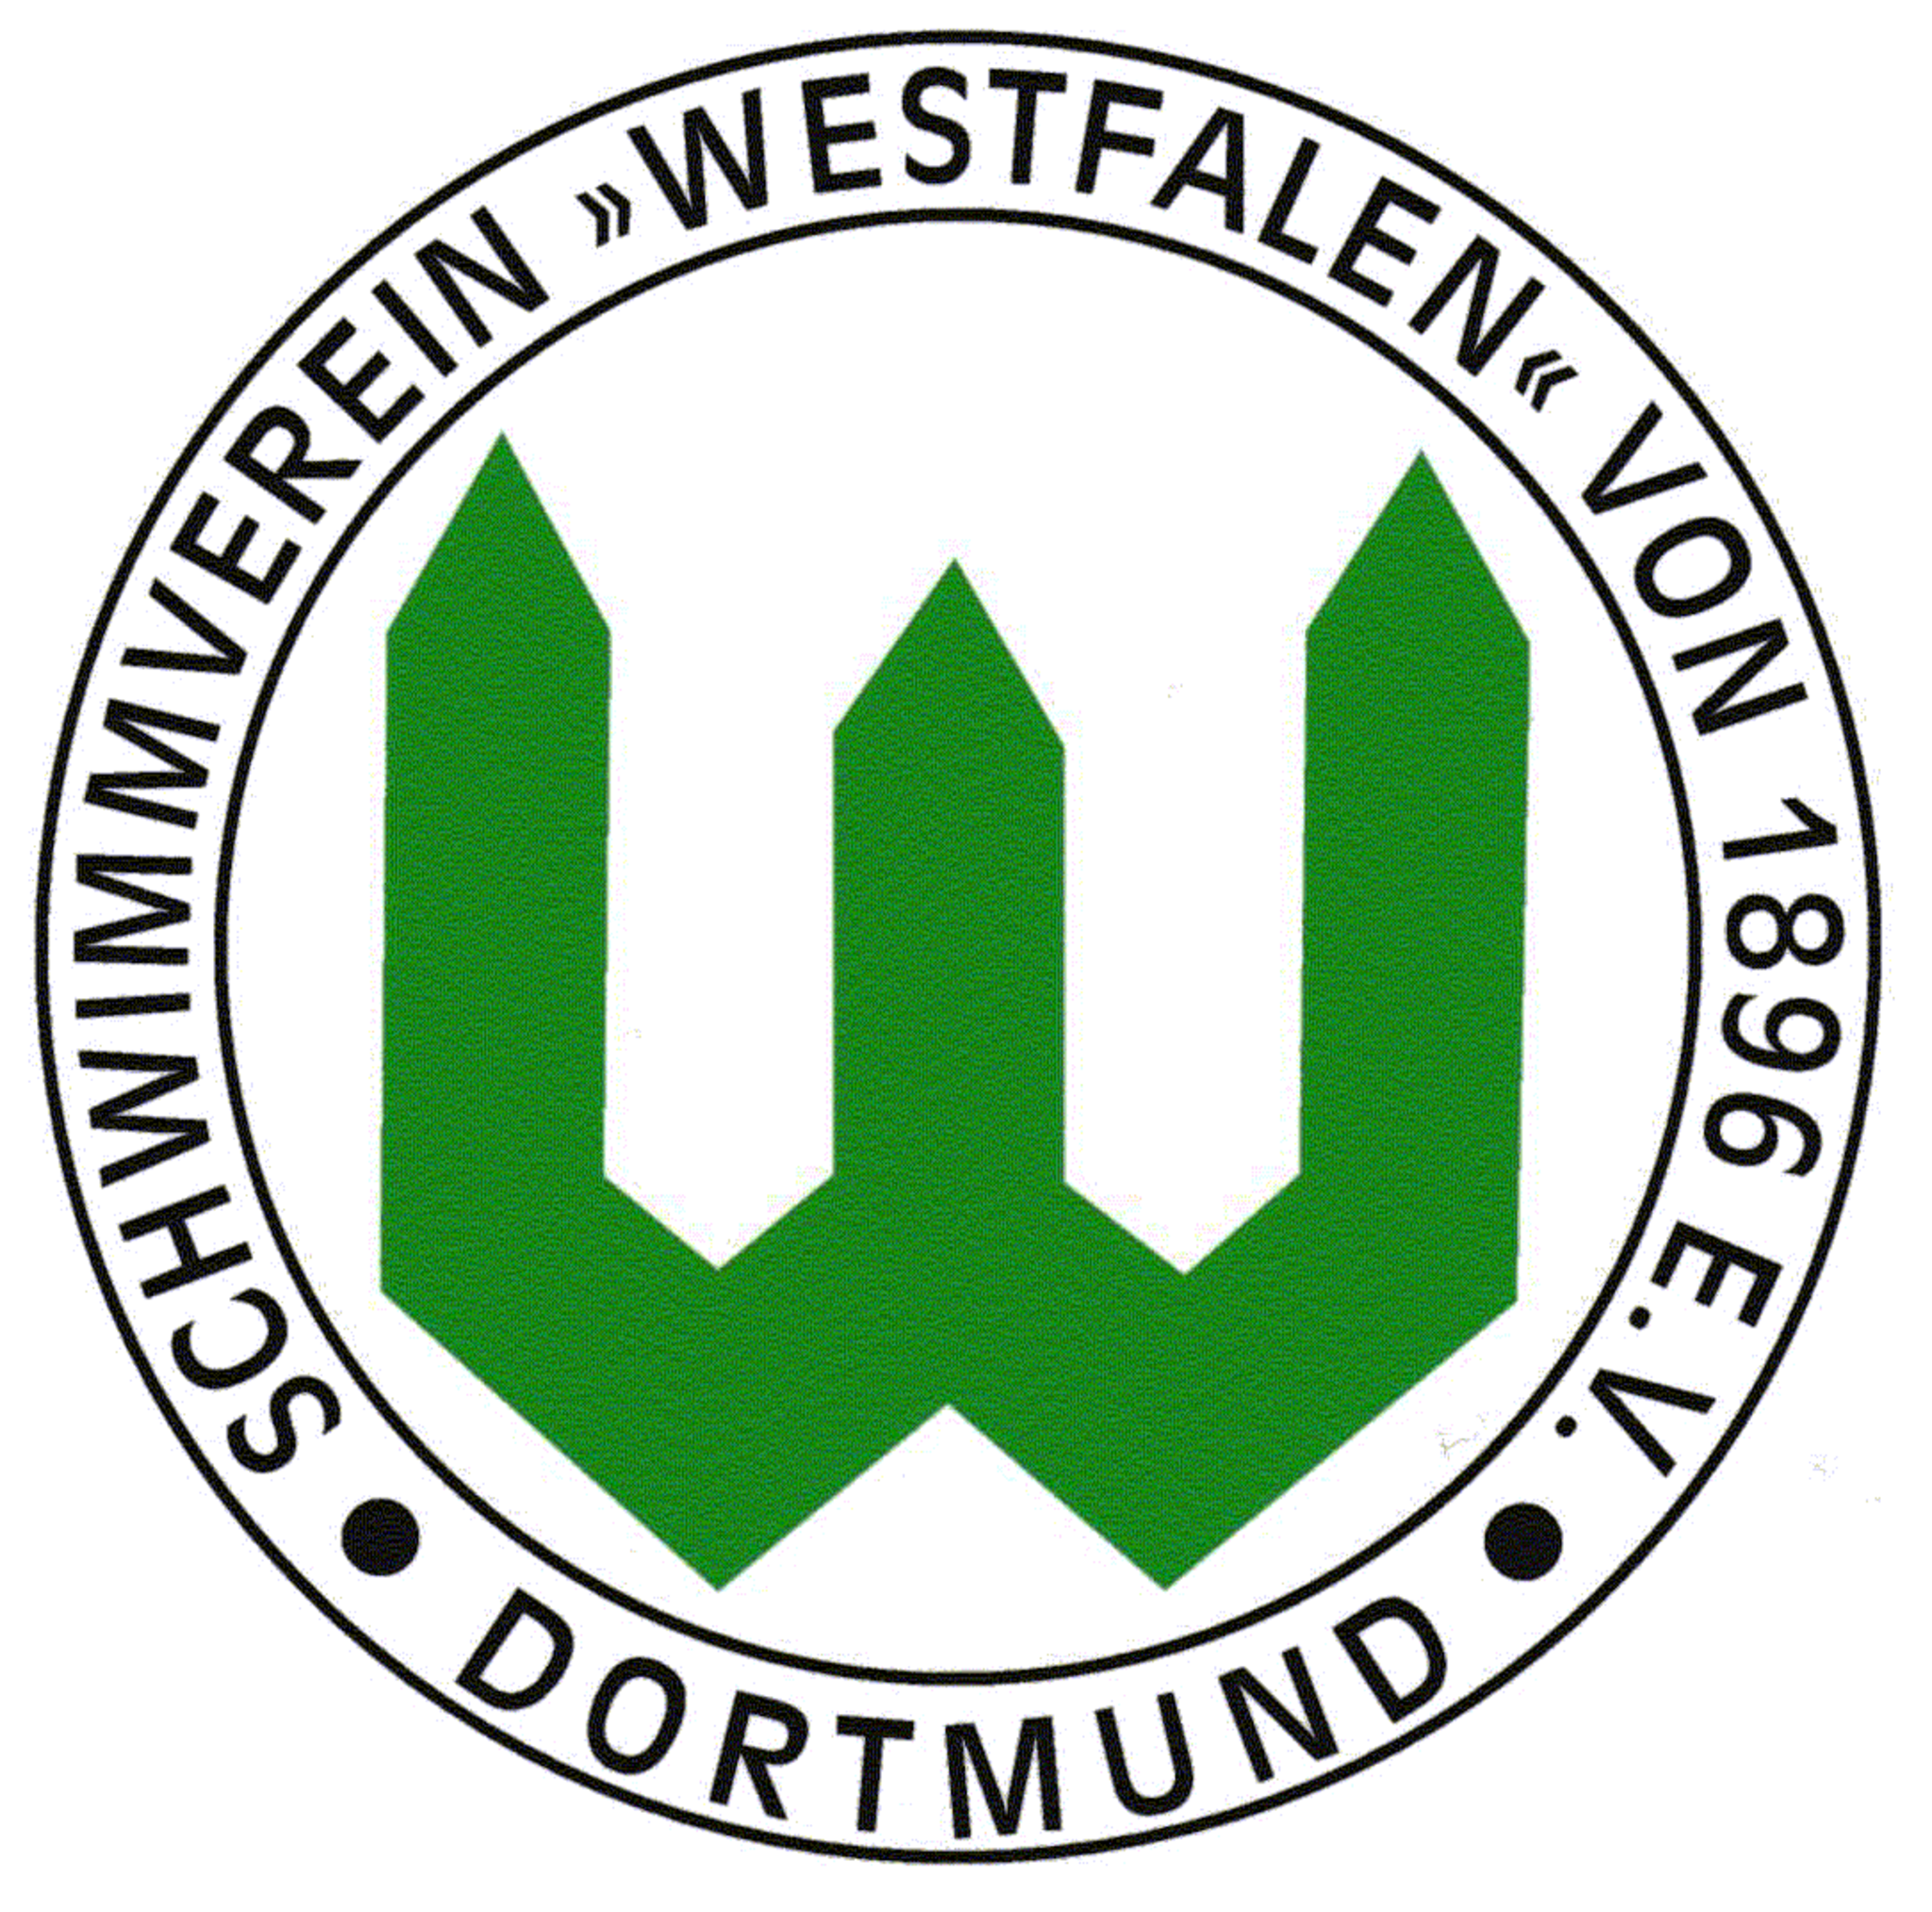 Sv Westfalen